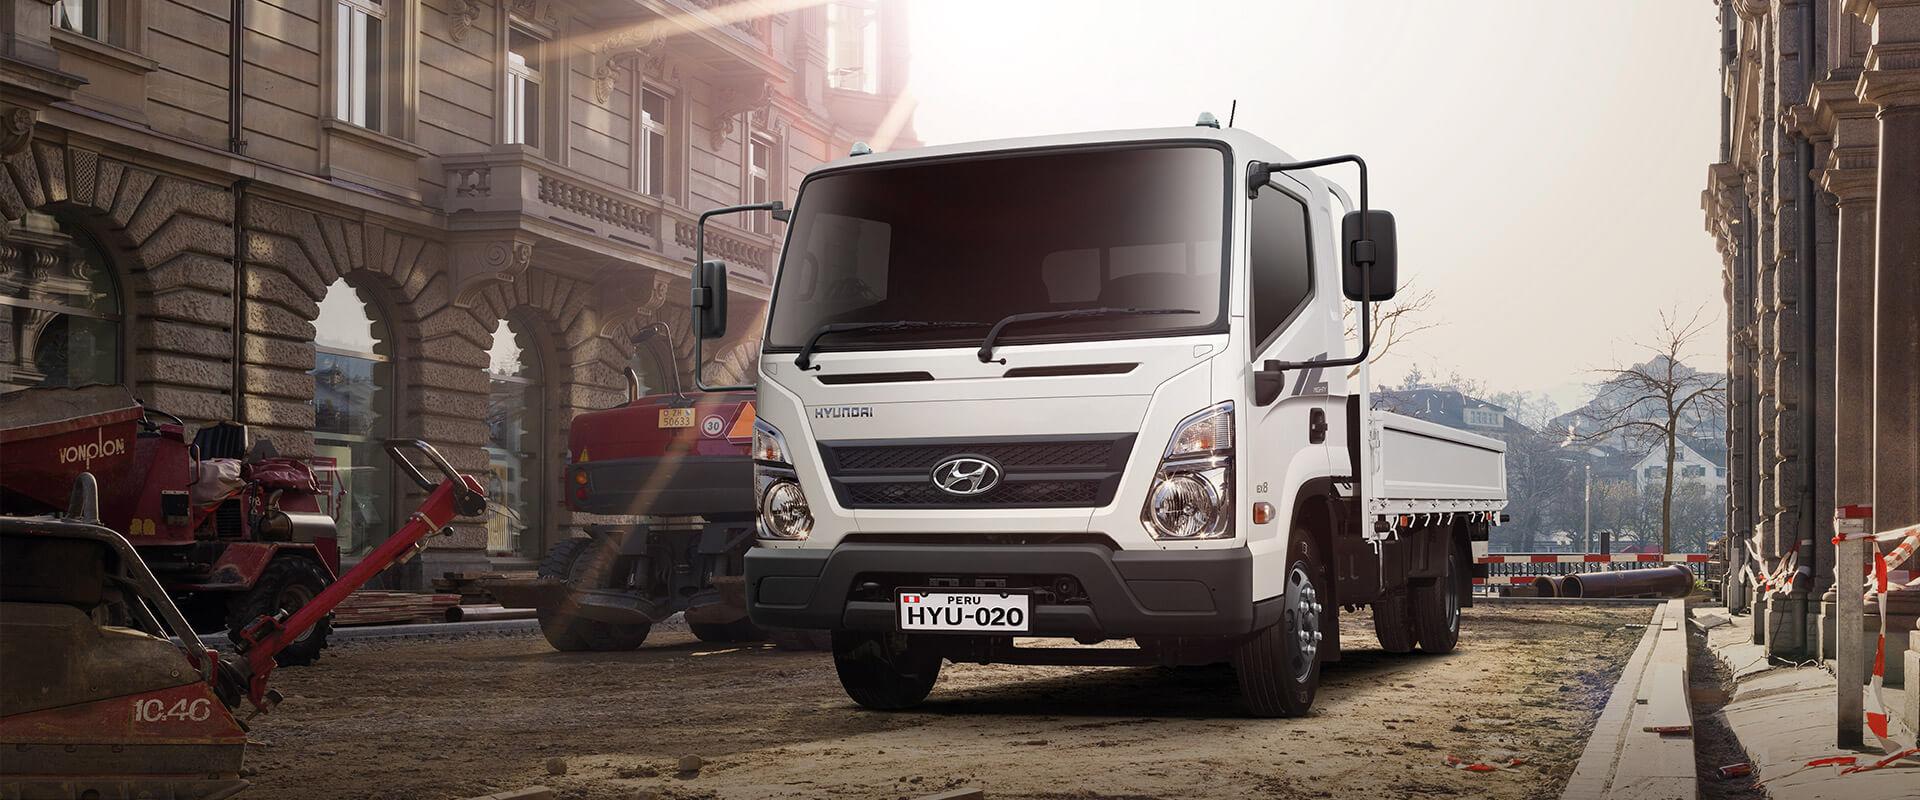 hyundai-camiones-header-ex8